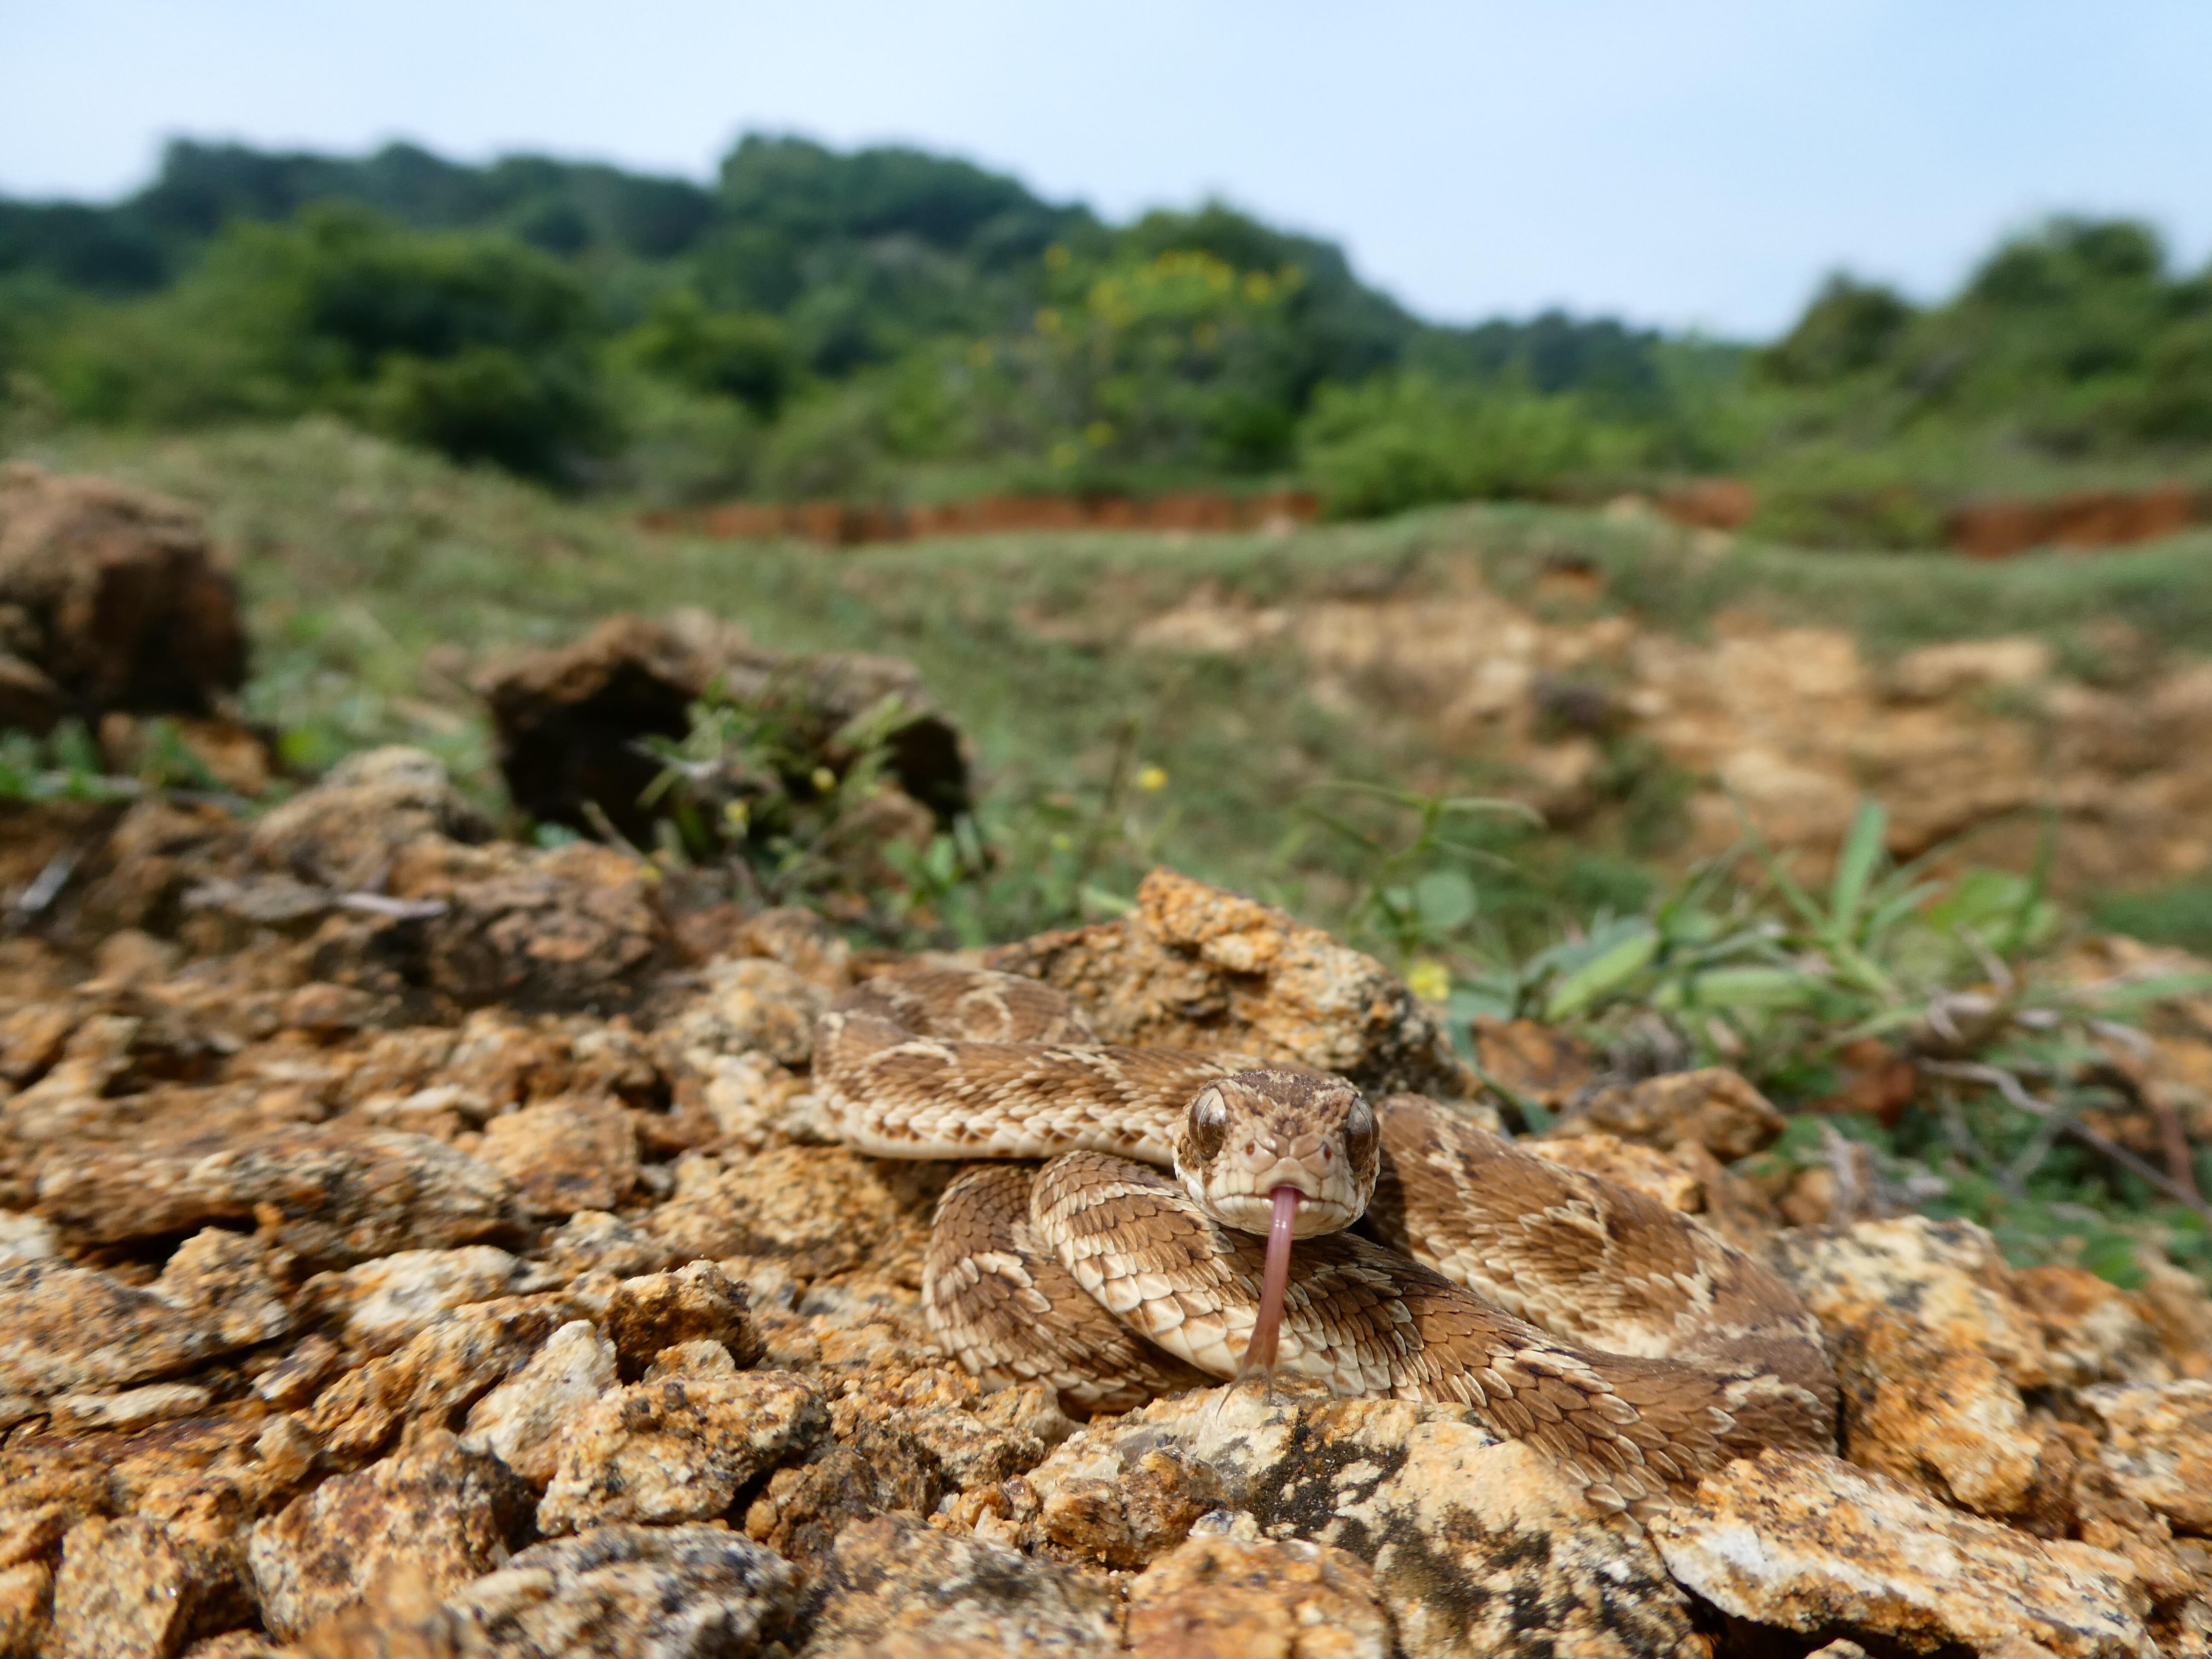 Echis carinatus India. Photo credit: Wolfgang Wurster